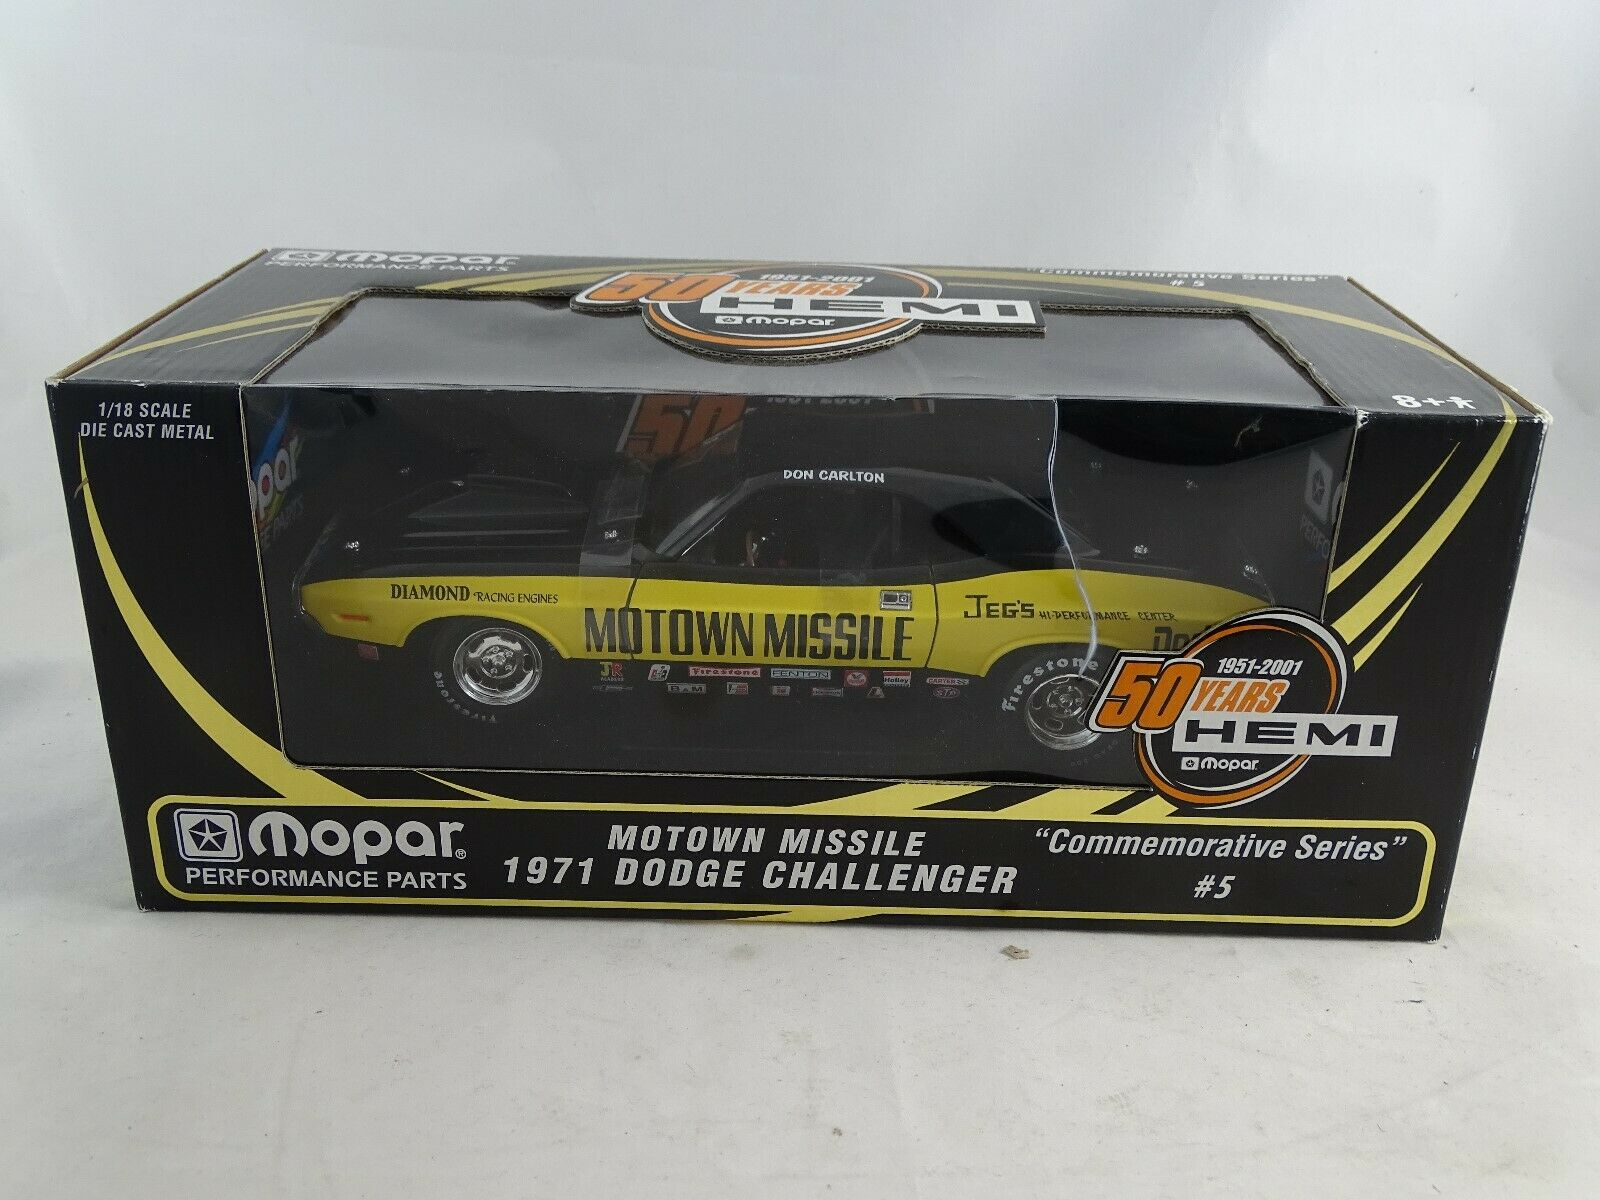 1 18 Ertl 29232P Conmemorativo Series Dodge Challenger Motown Misiles